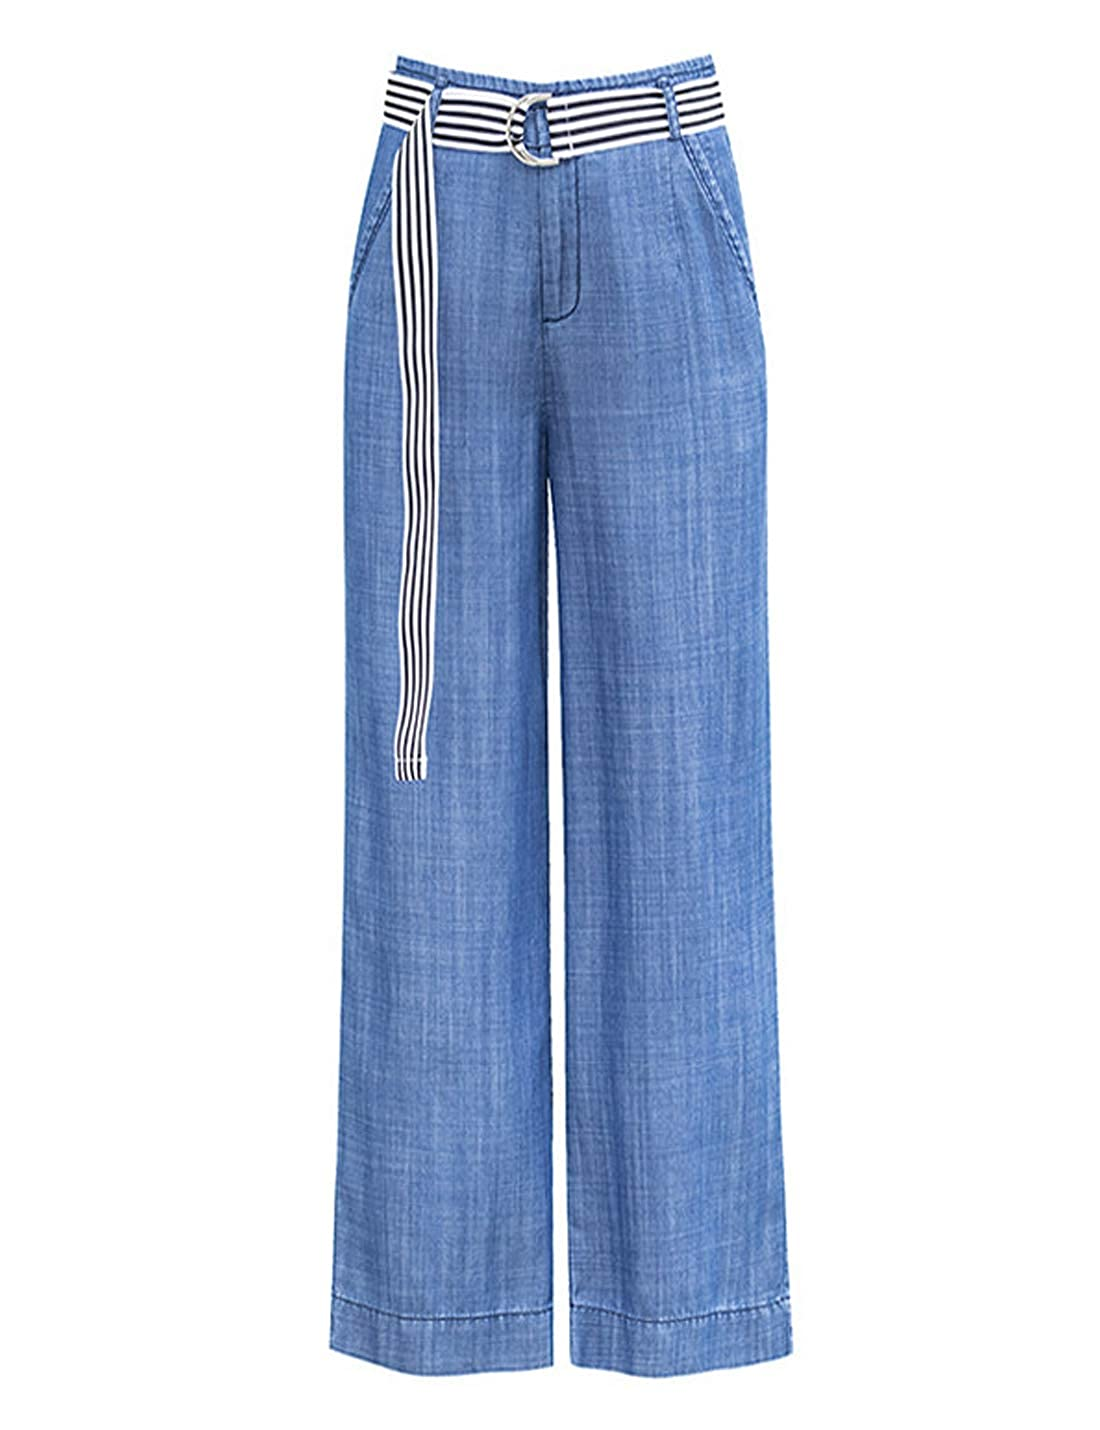 Omoone Womens High Waist Wide Leg Tencel Denim Pants Soft Loose Palazzo Jeans